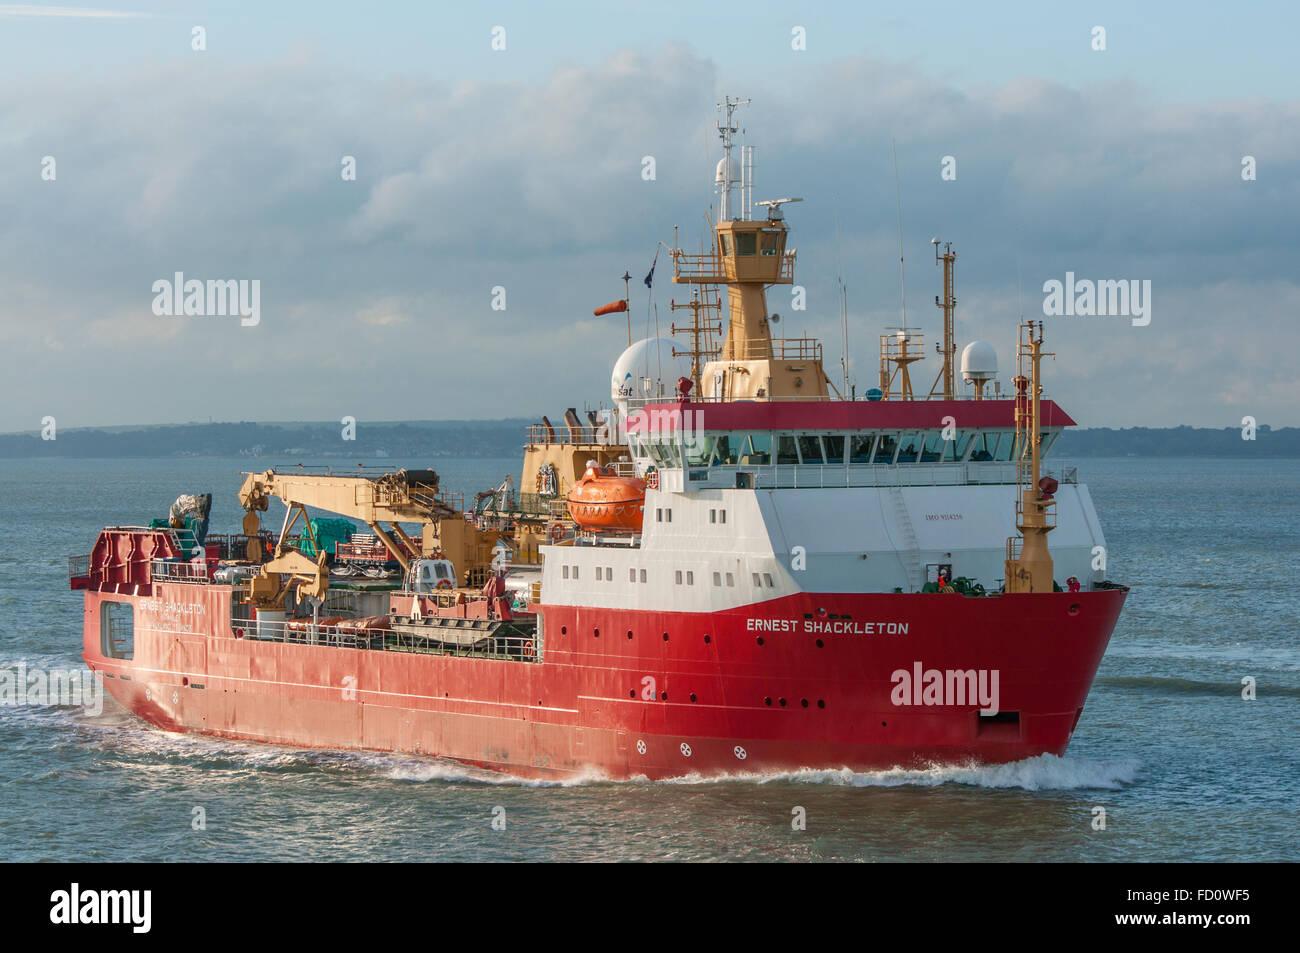 The British Antarctic Survey research ship RRS Ernest Shackleton arriving at Portsmouth, UK on the 5th November - Stock Image